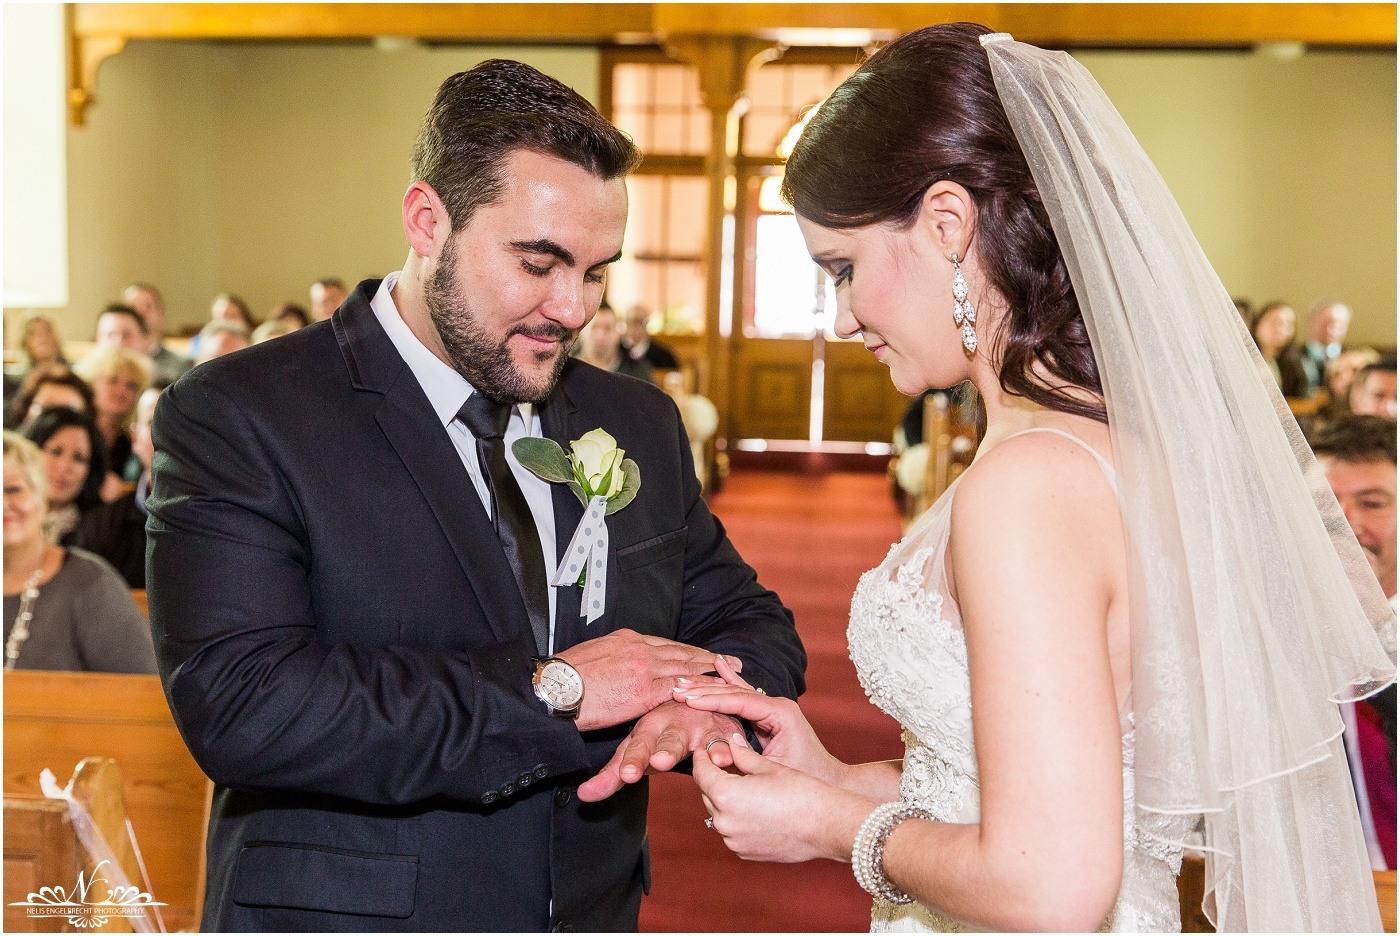 Eensgezind-Wedding-Photos-Nelis-Engelbrecht-Photography-067